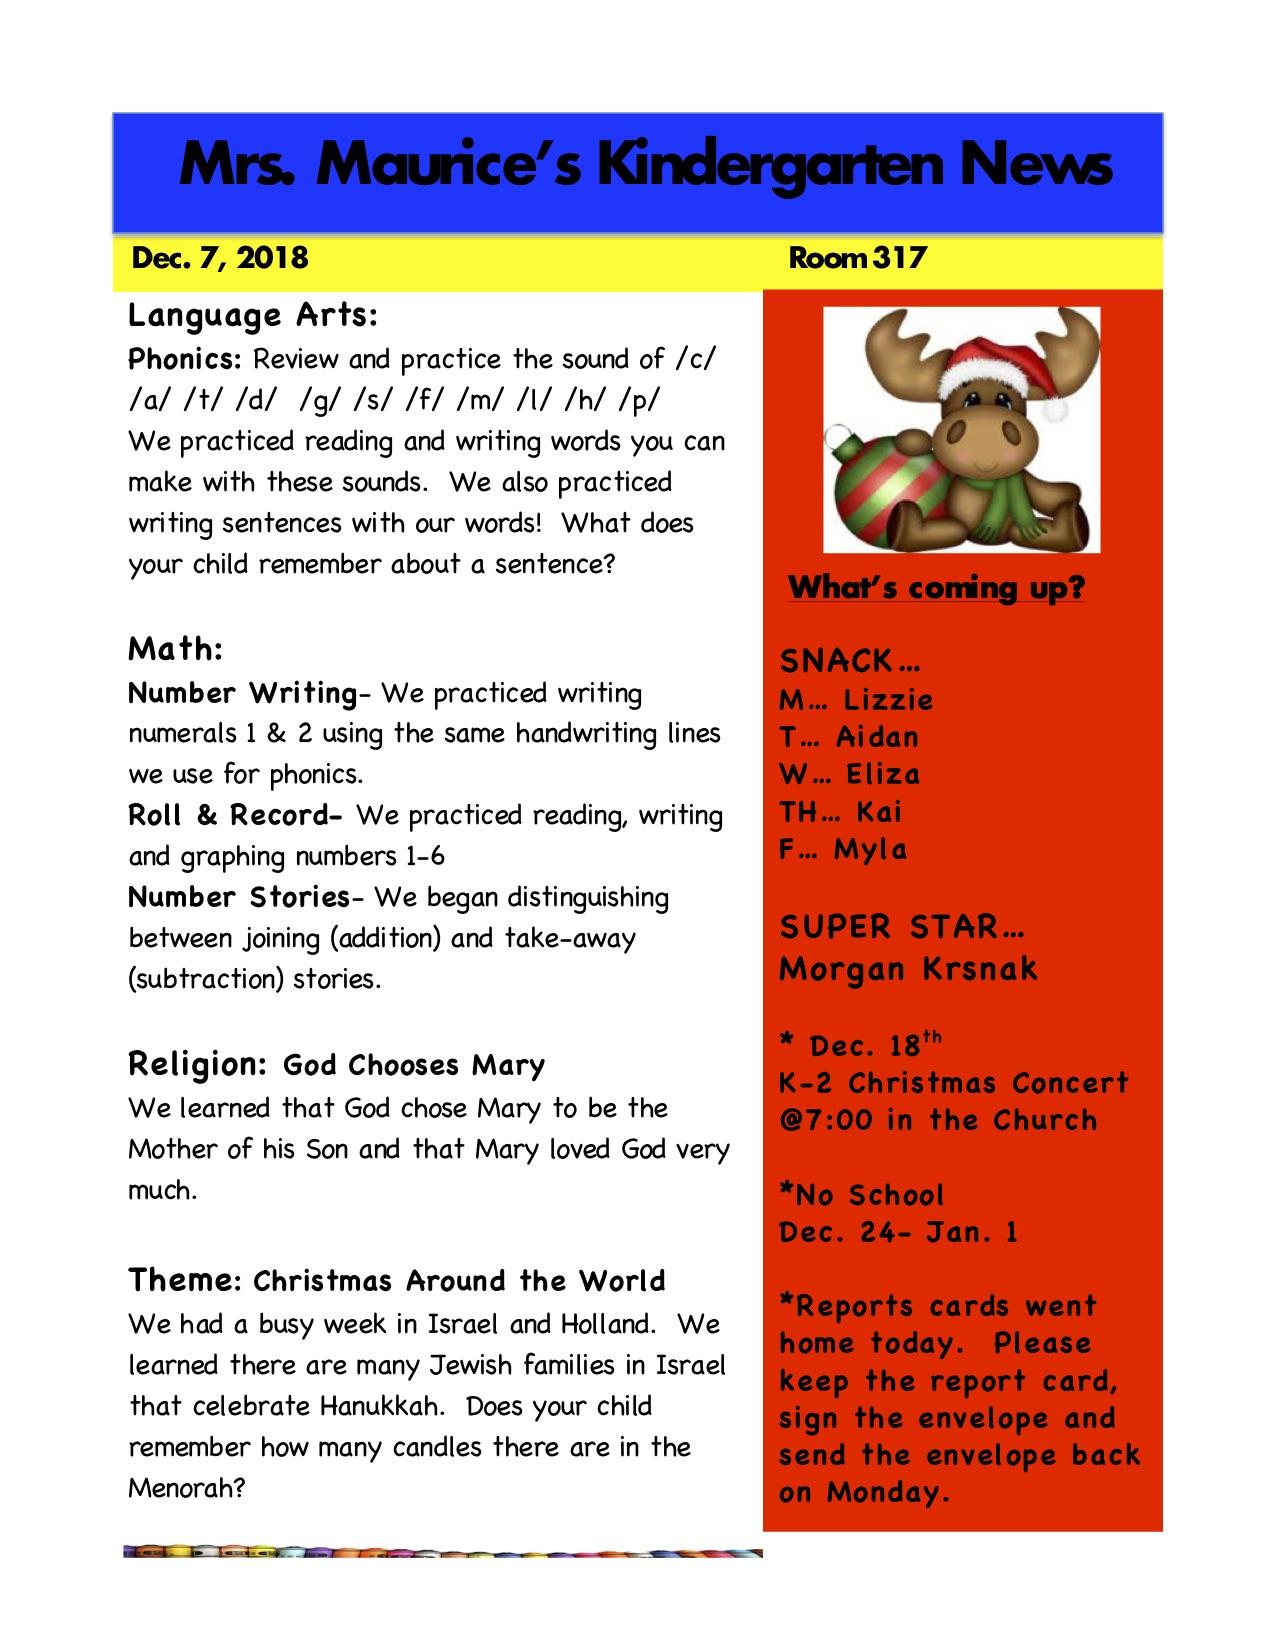 Kindergarten News Dec. 7th.jpg